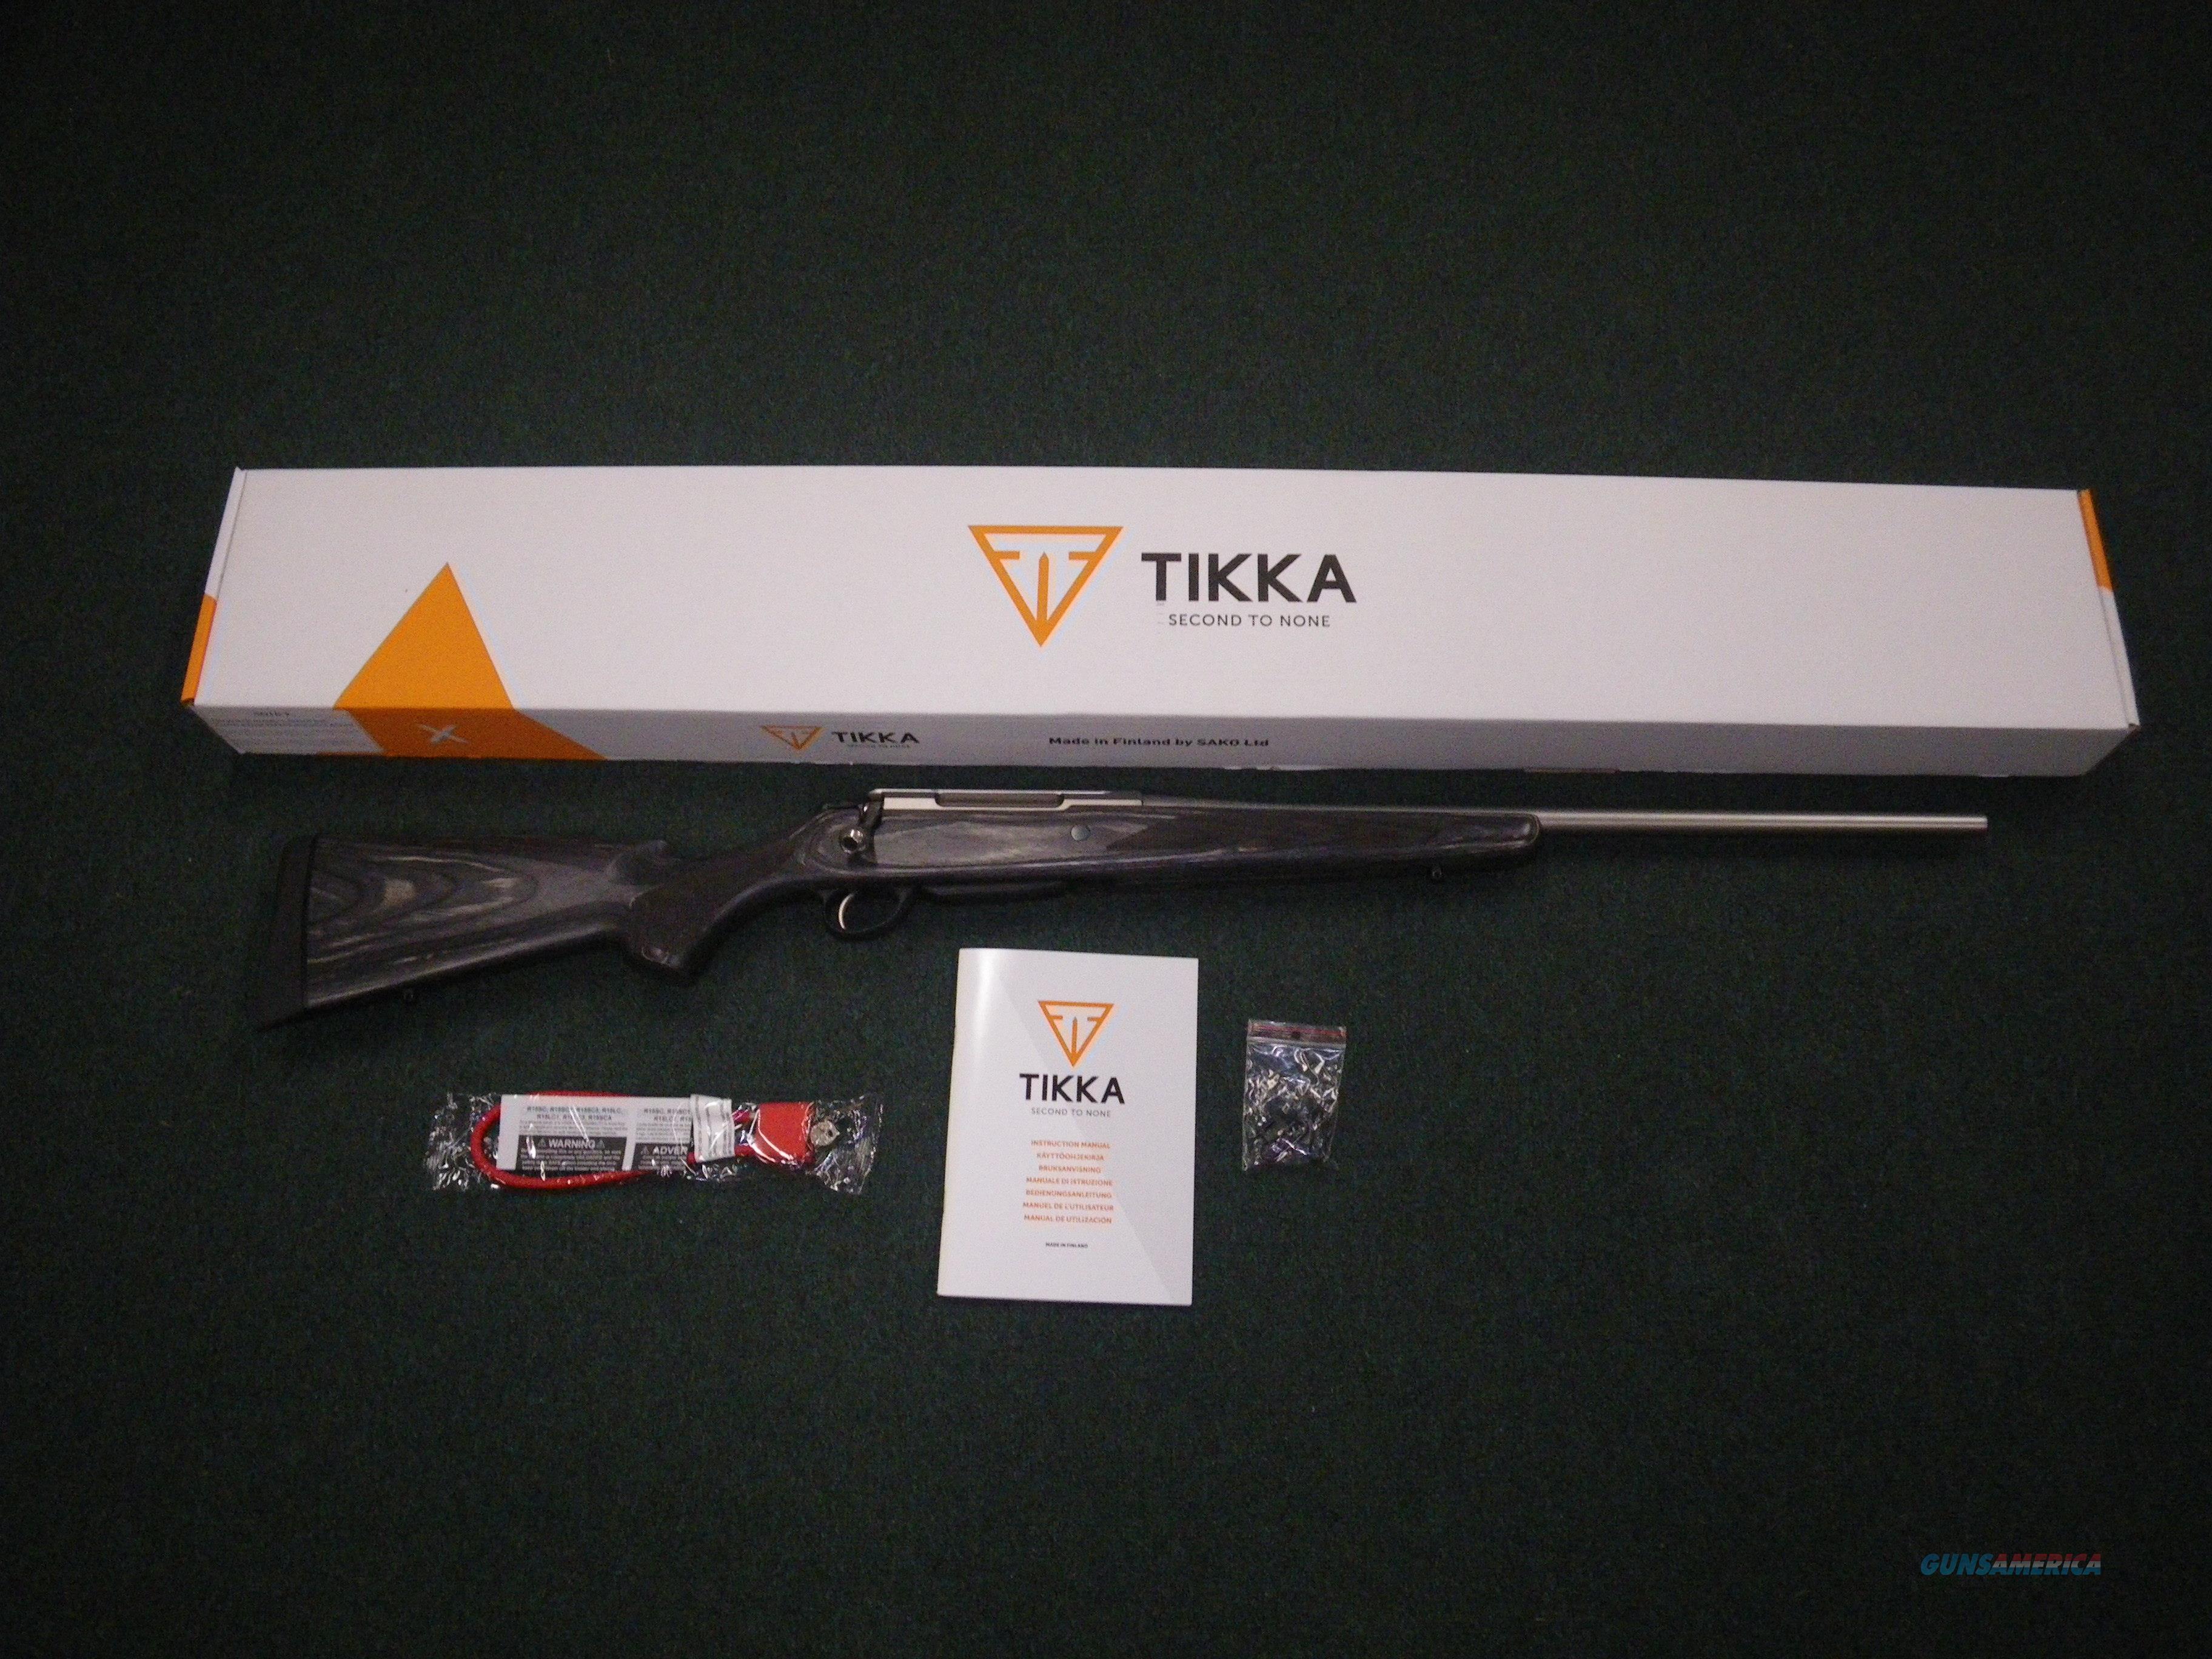 "Tikka T3x Laminated Stainless 270 WSM 24.3"" NEW #JRTXG340  Guns > Rifles > Tikka Rifles > T3"